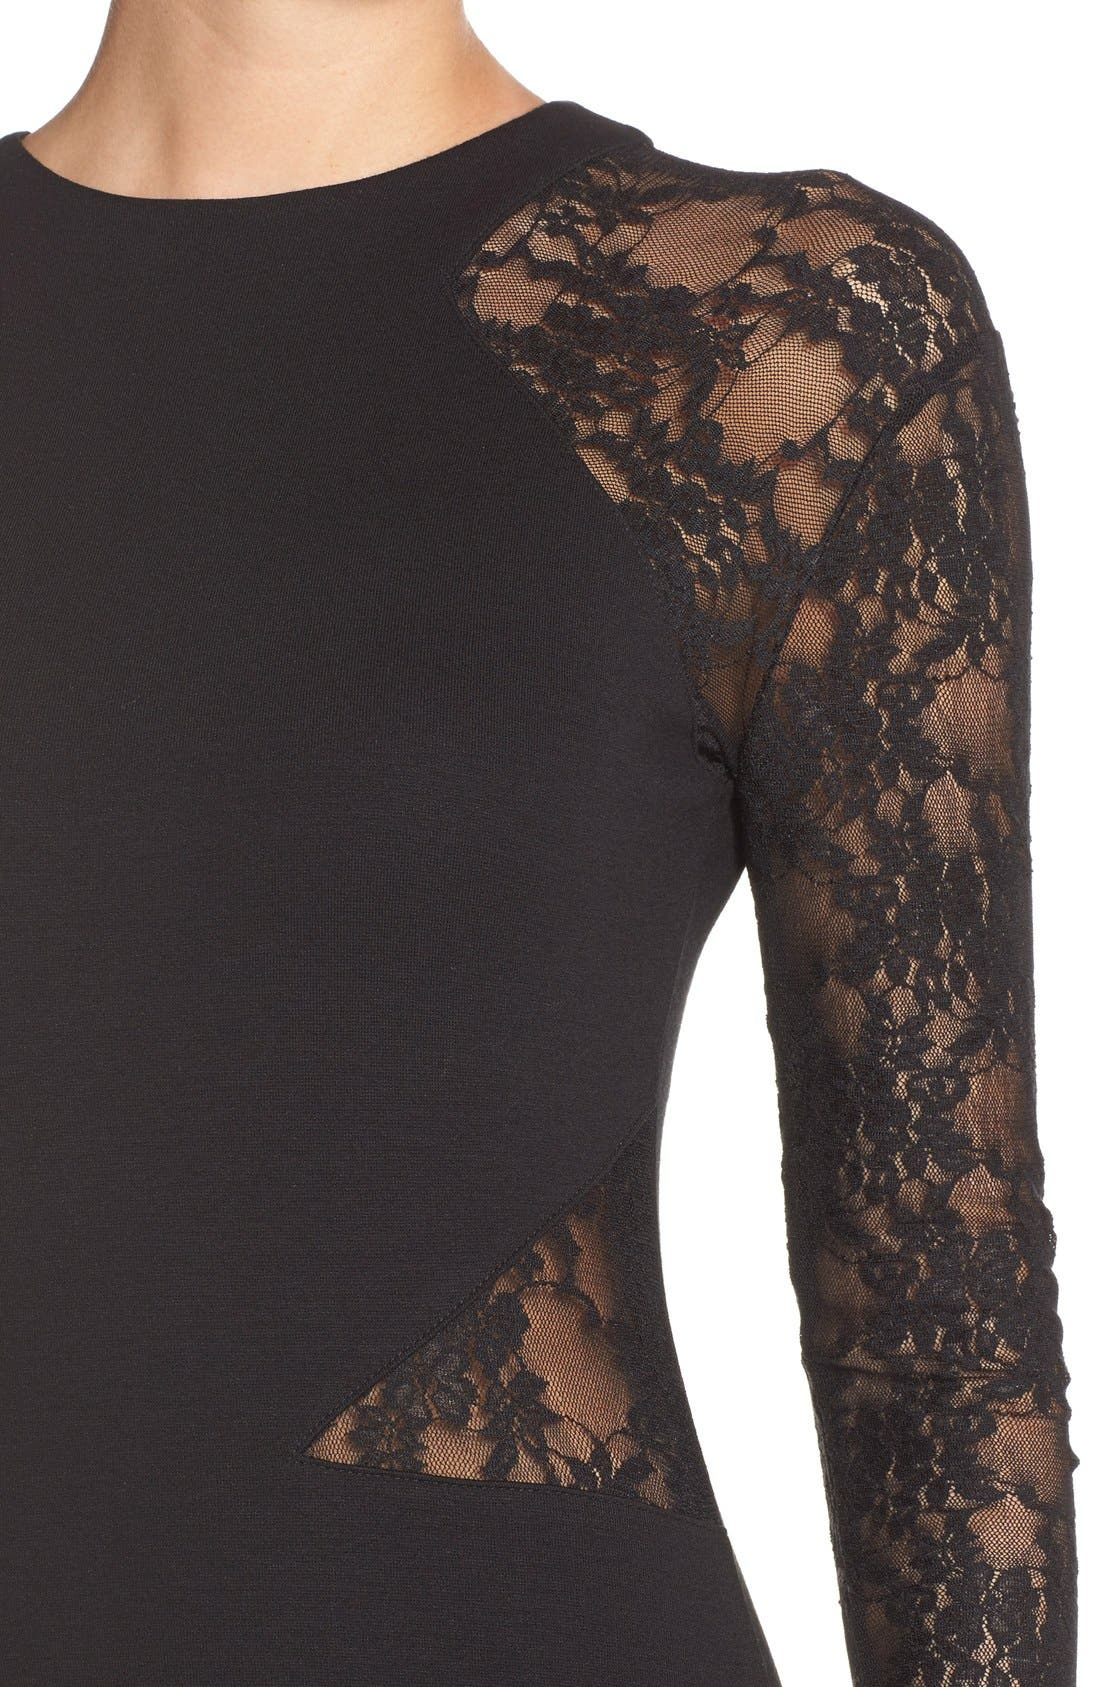 'Viven' Lace & Jersey Sheath Dress,                             Alternate thumbnail 4, color,                             001